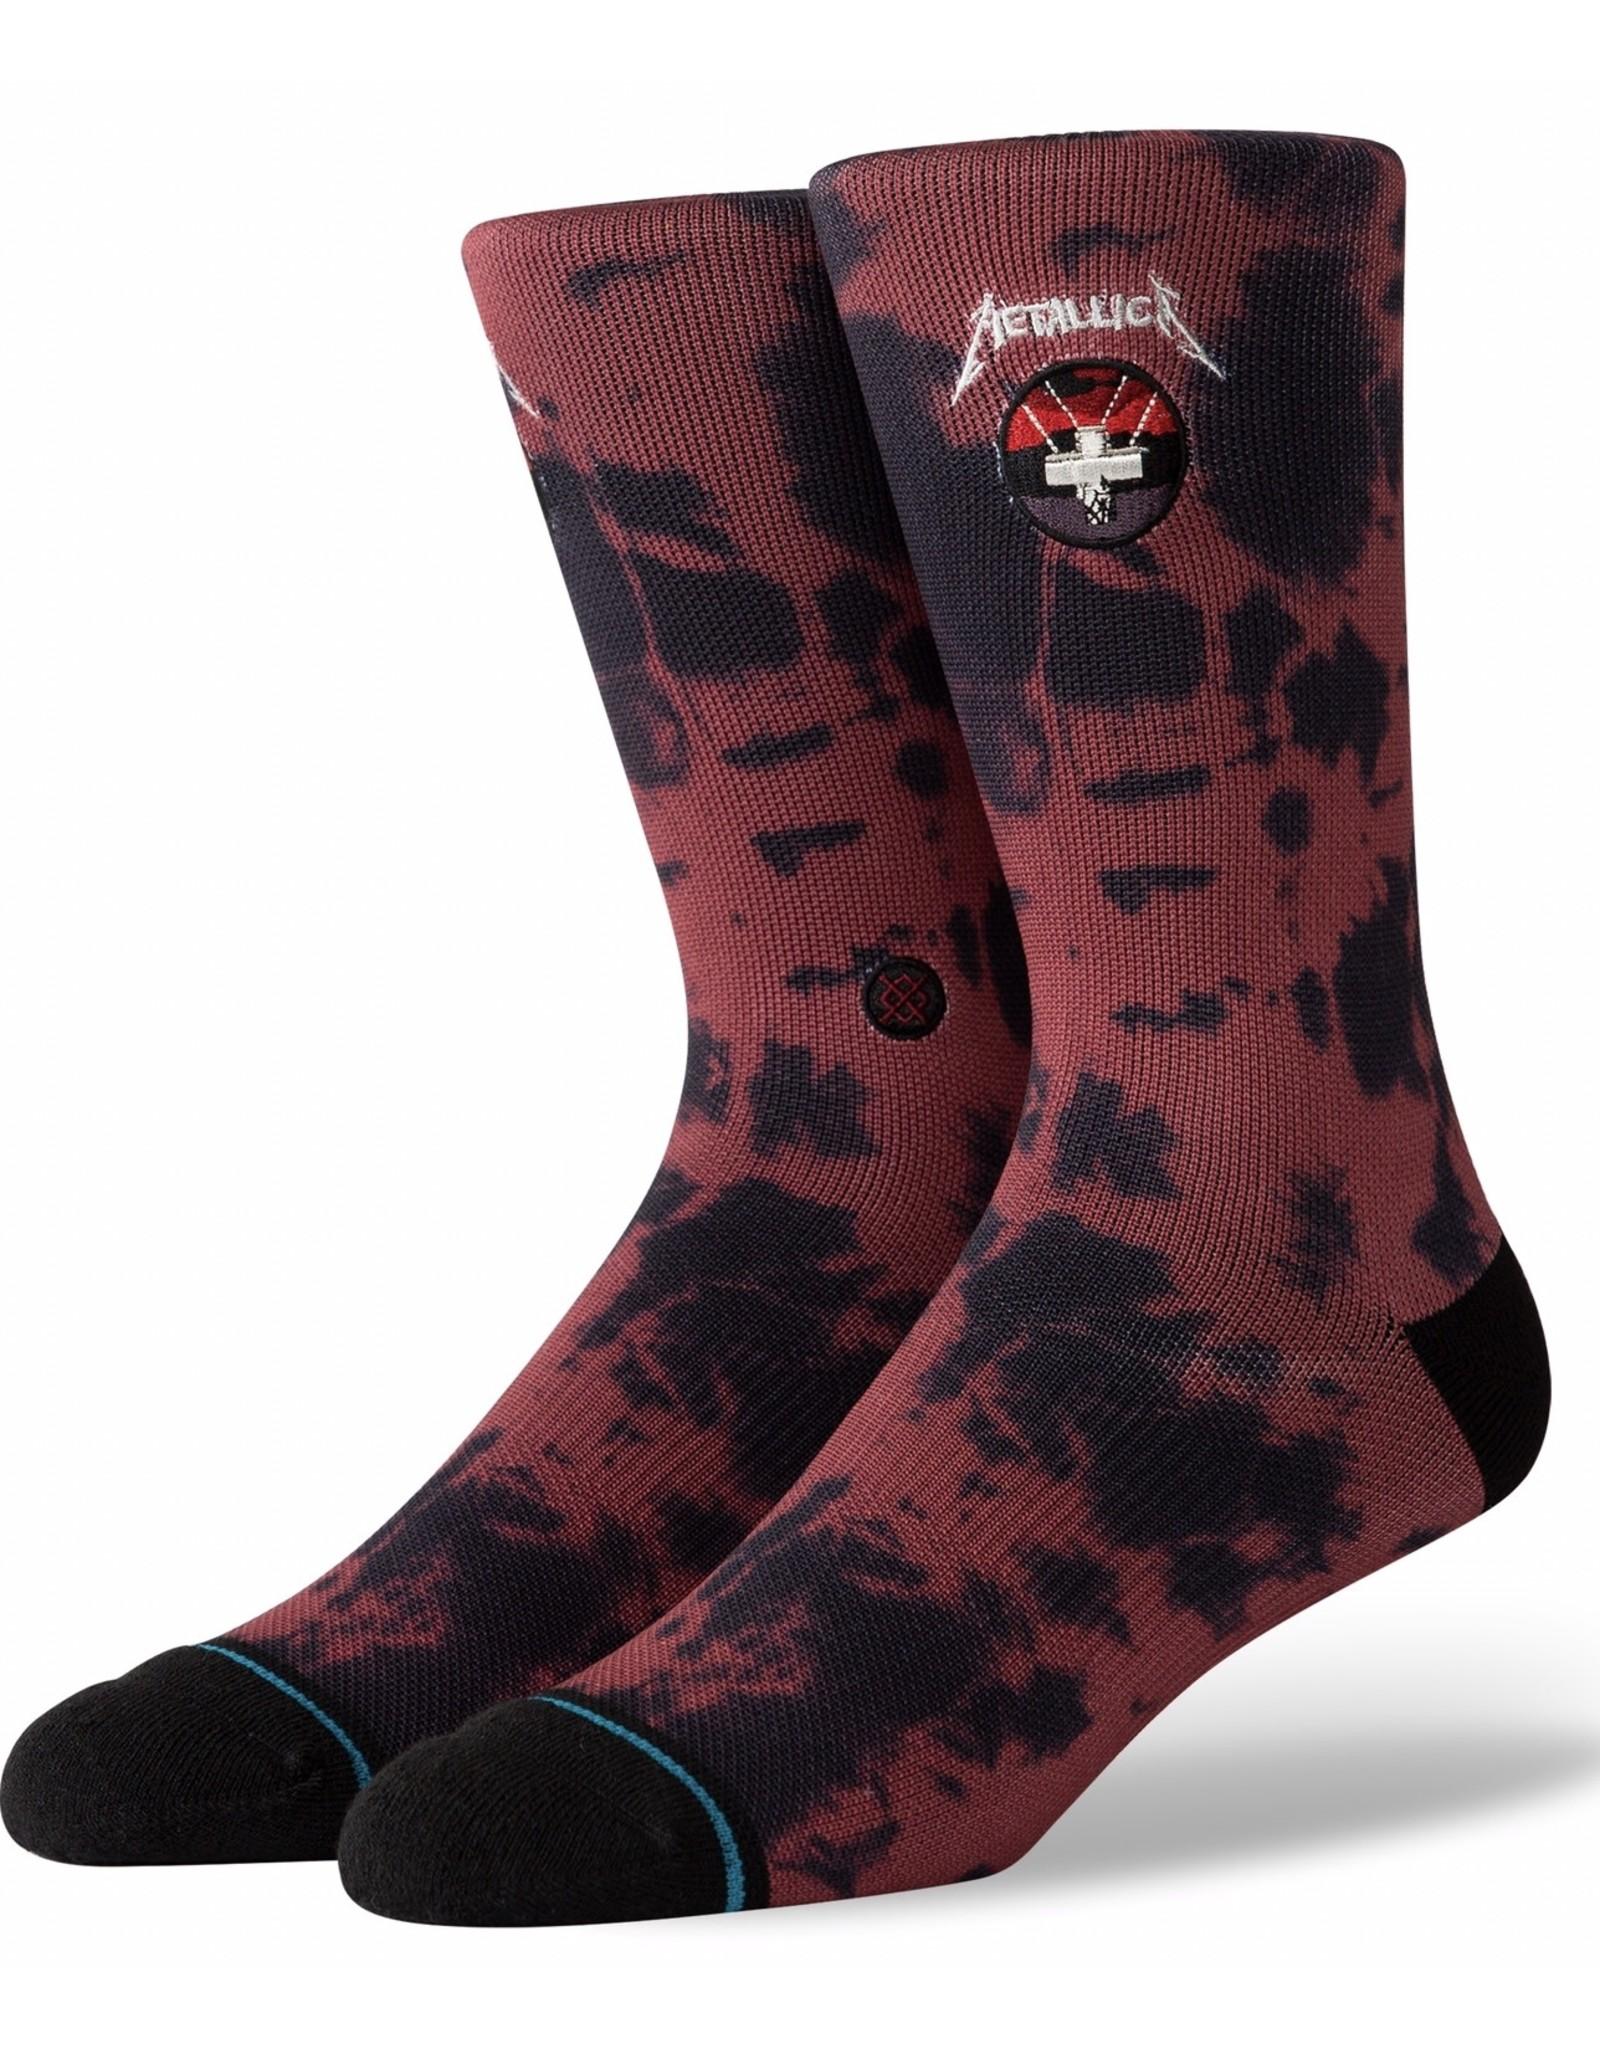 Stance Metallica Classic Sock (L)